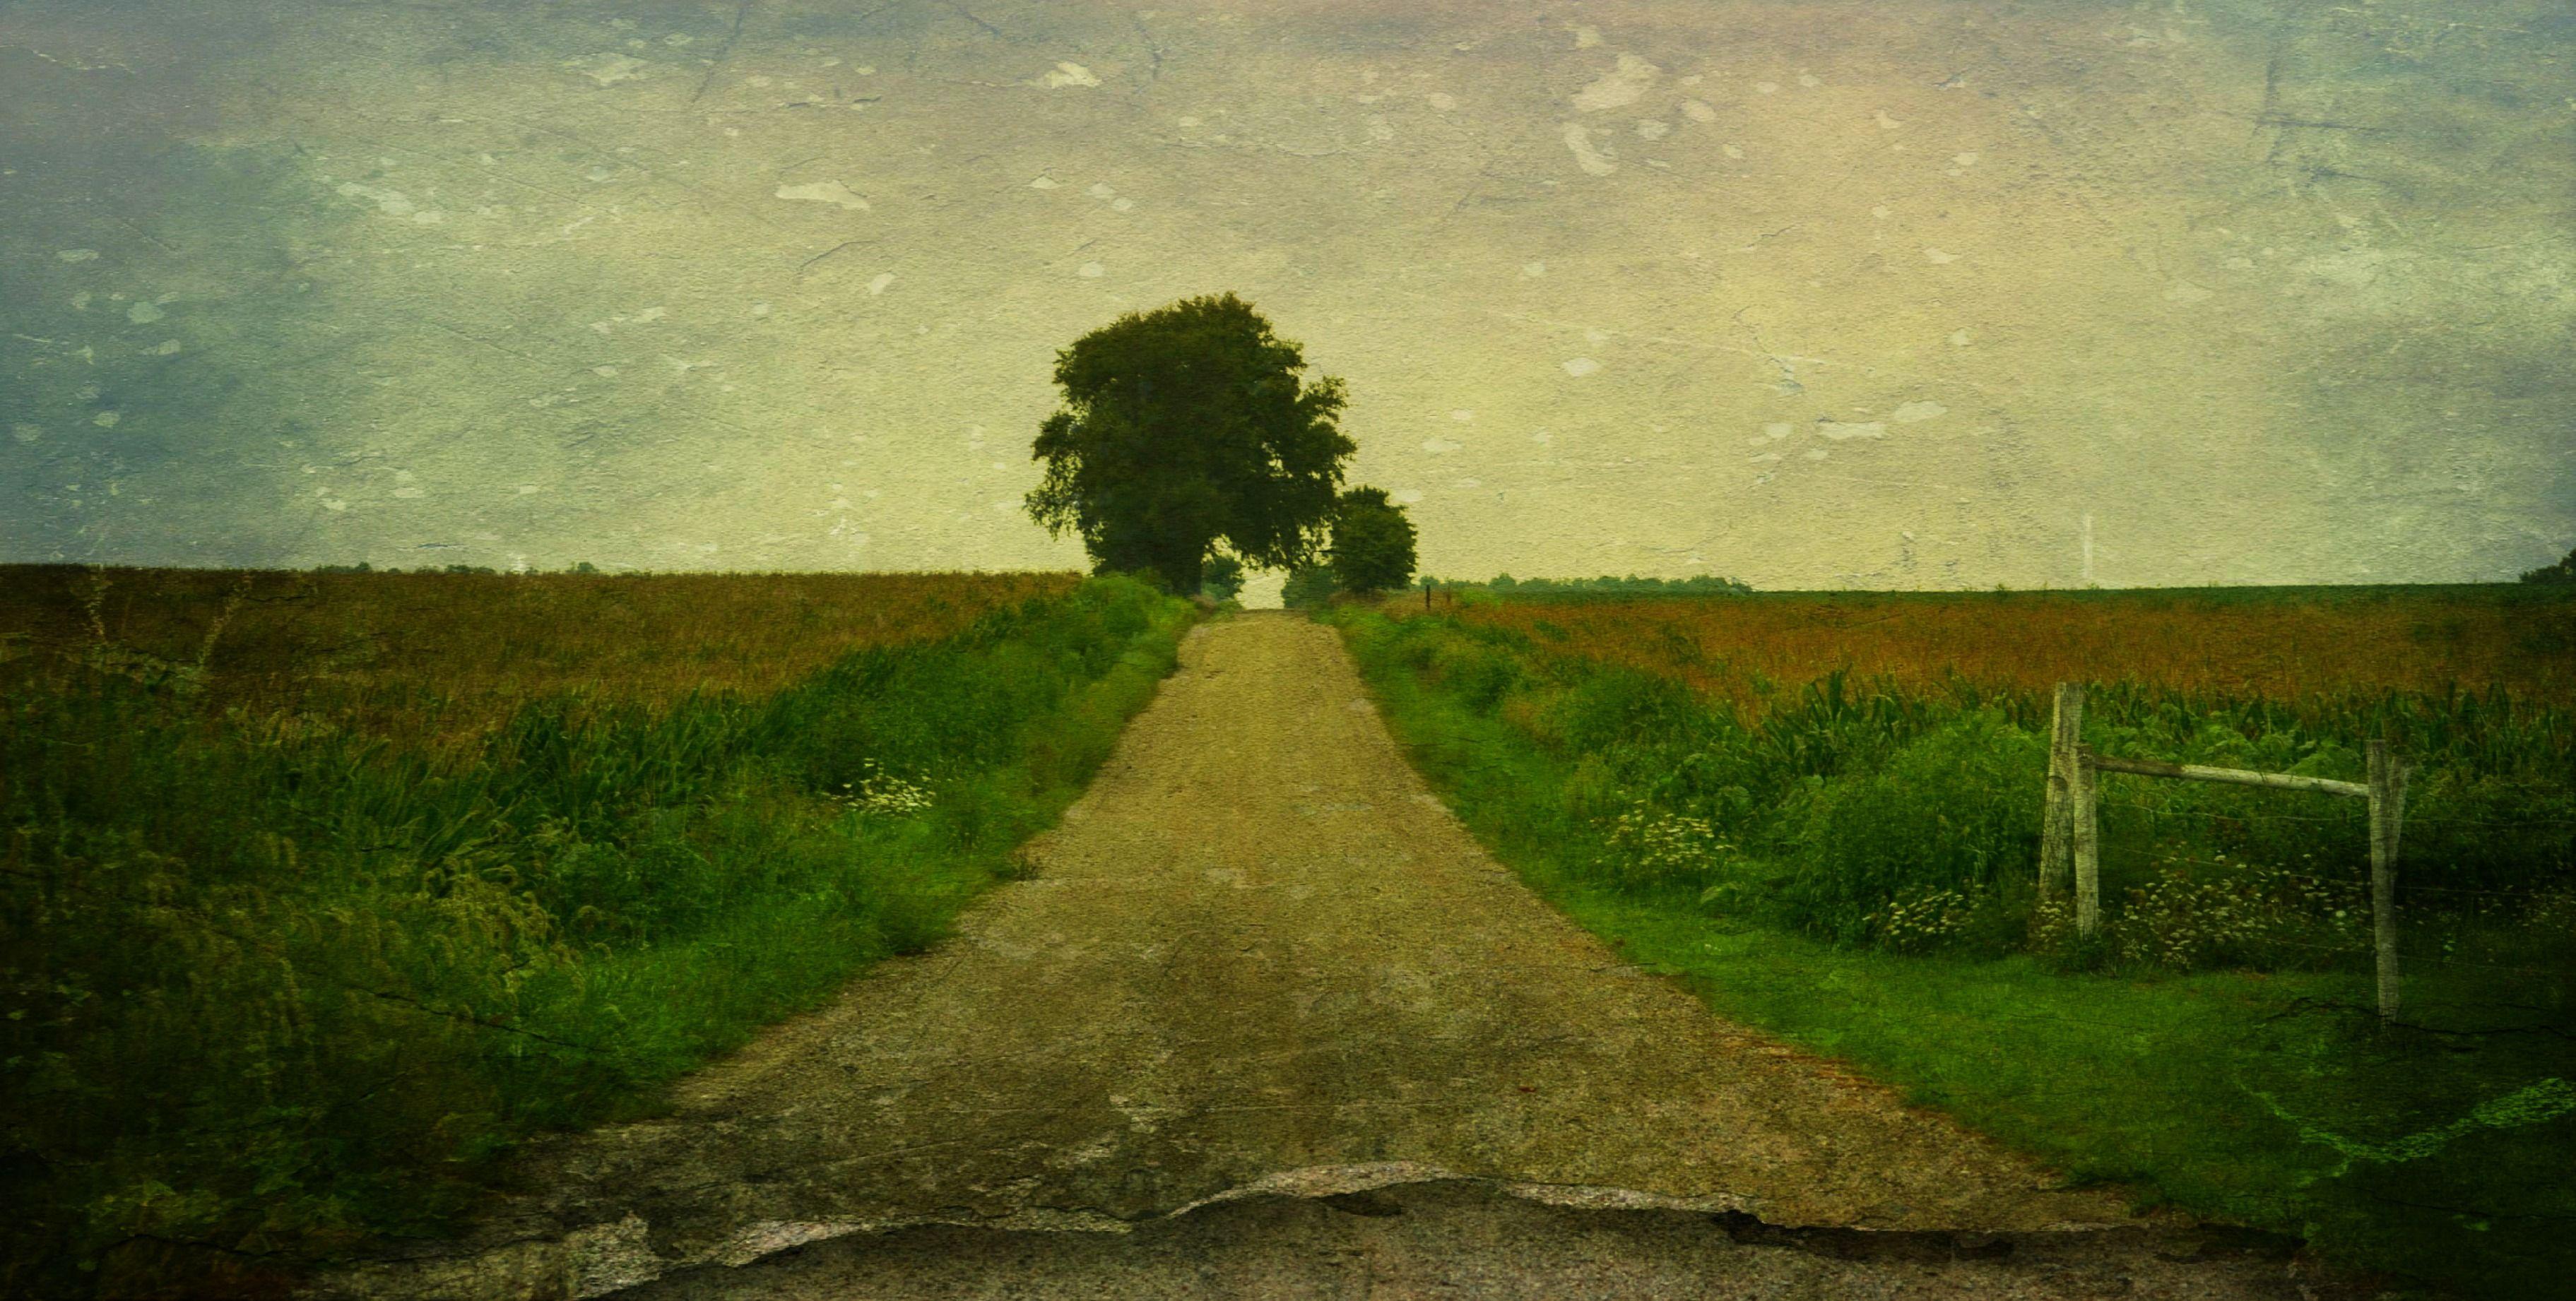 rural Indiana